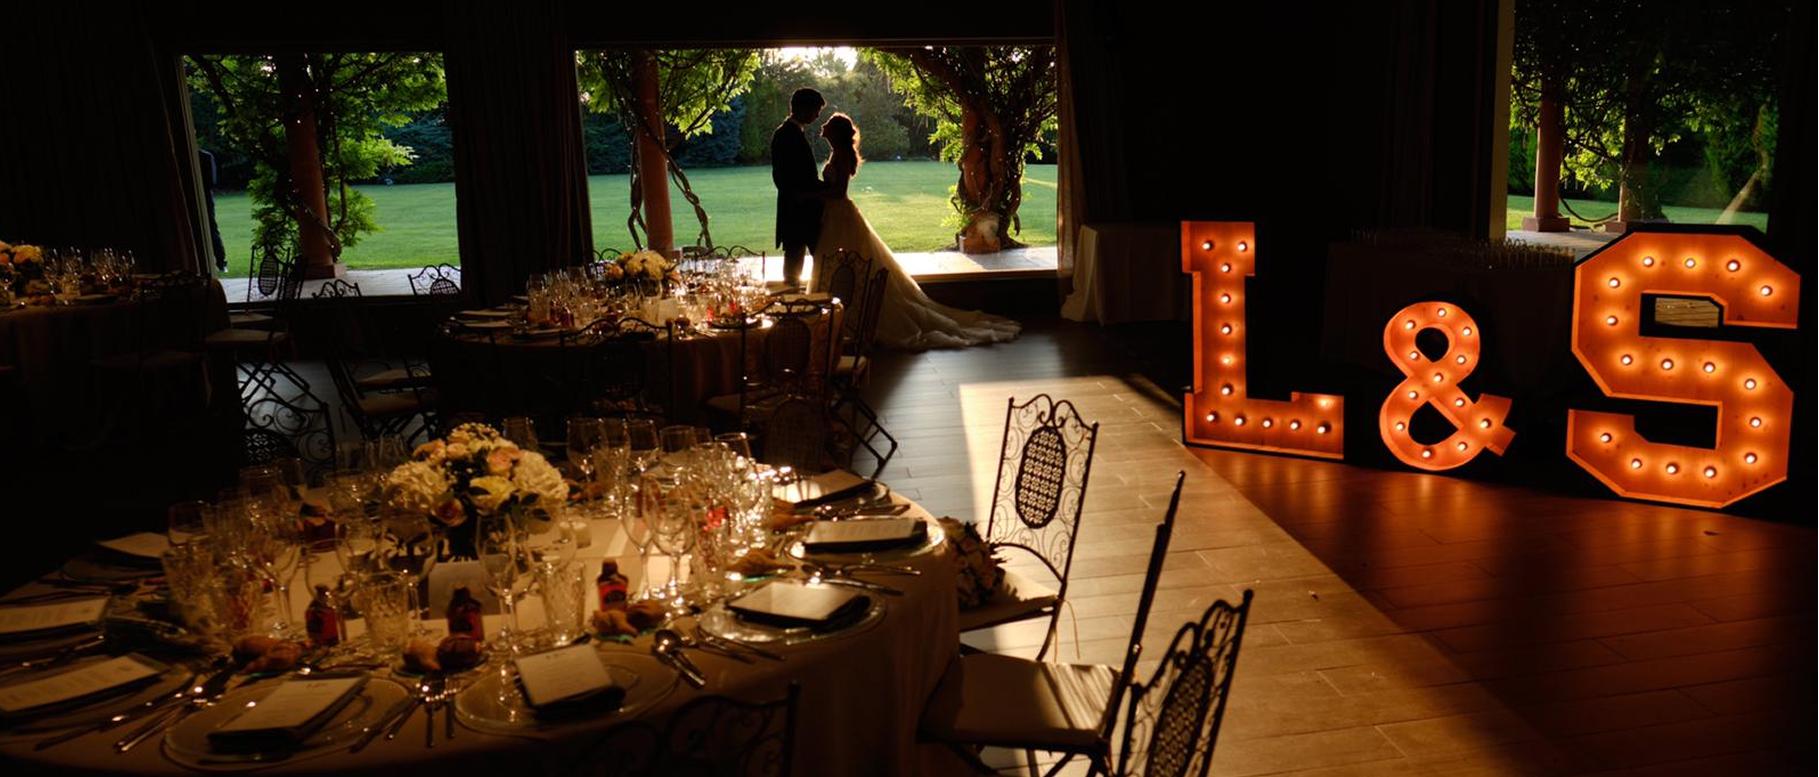 Alquiler pack de letras luminosas de madera para bodas en Barcelona - BCN LETTERS